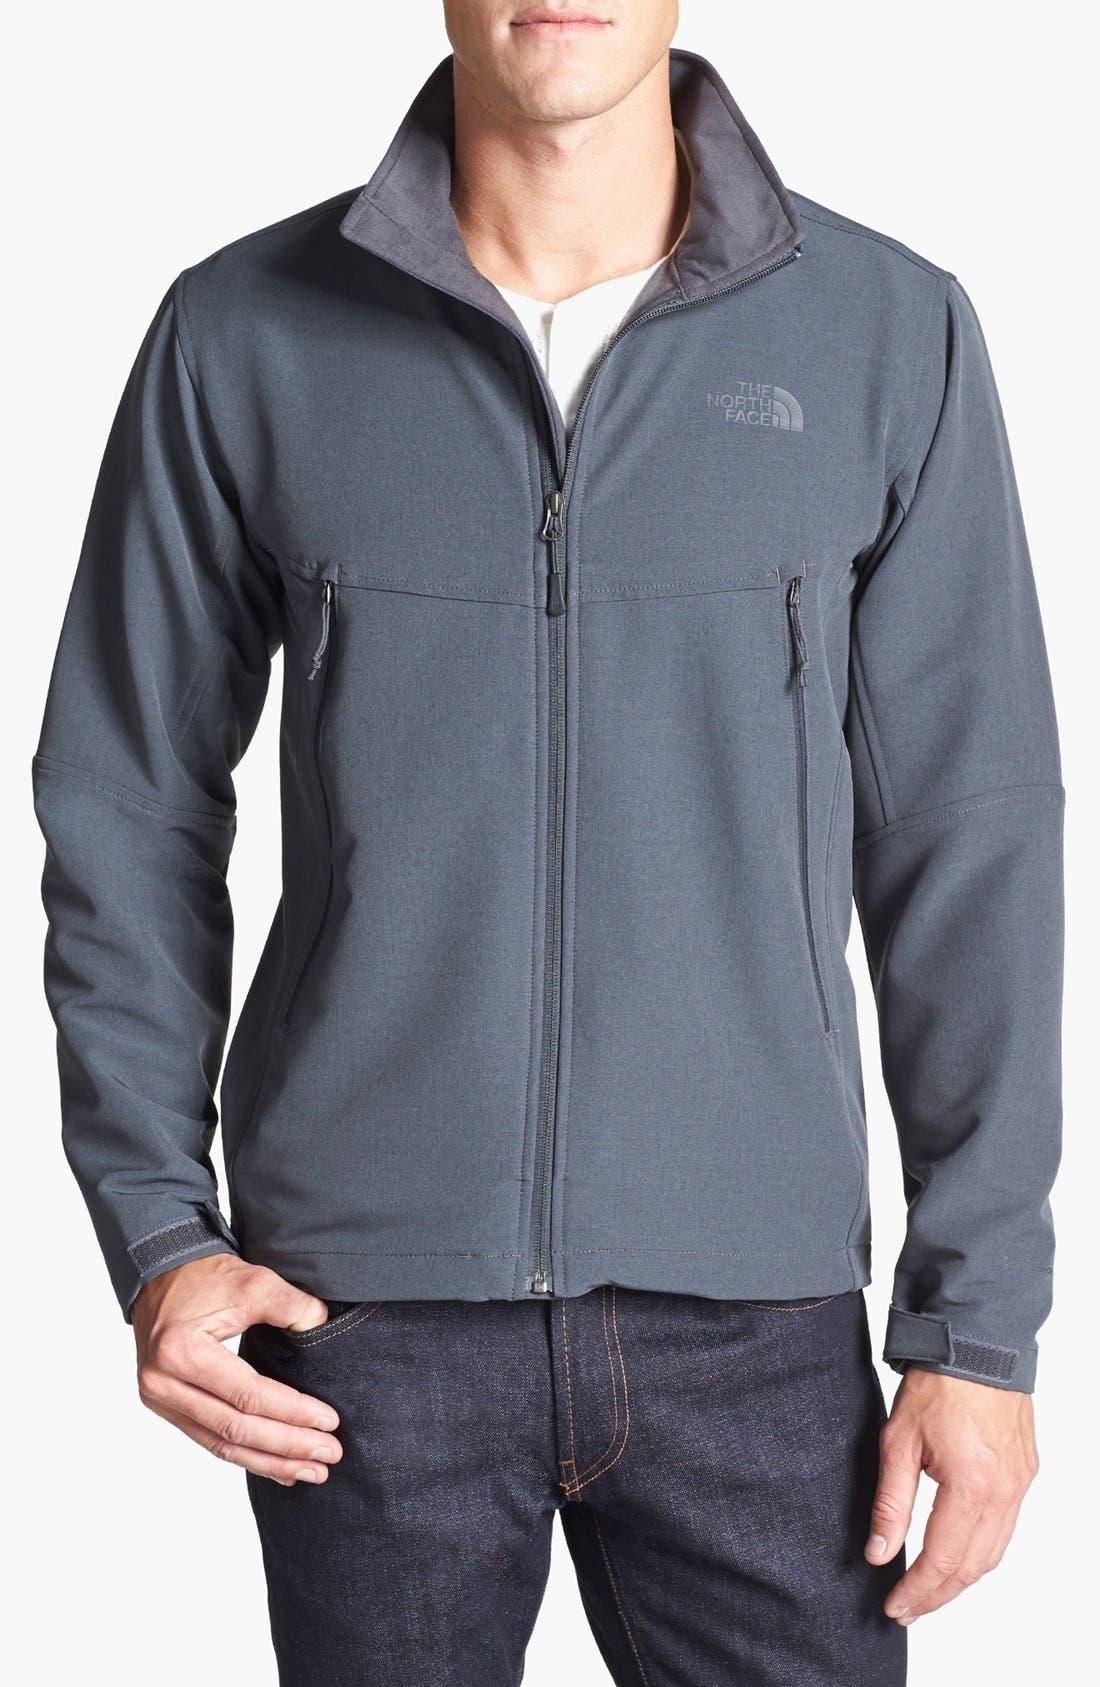 Main Image - The North Face 'RDT' FlashDry™ Softshell Jacket